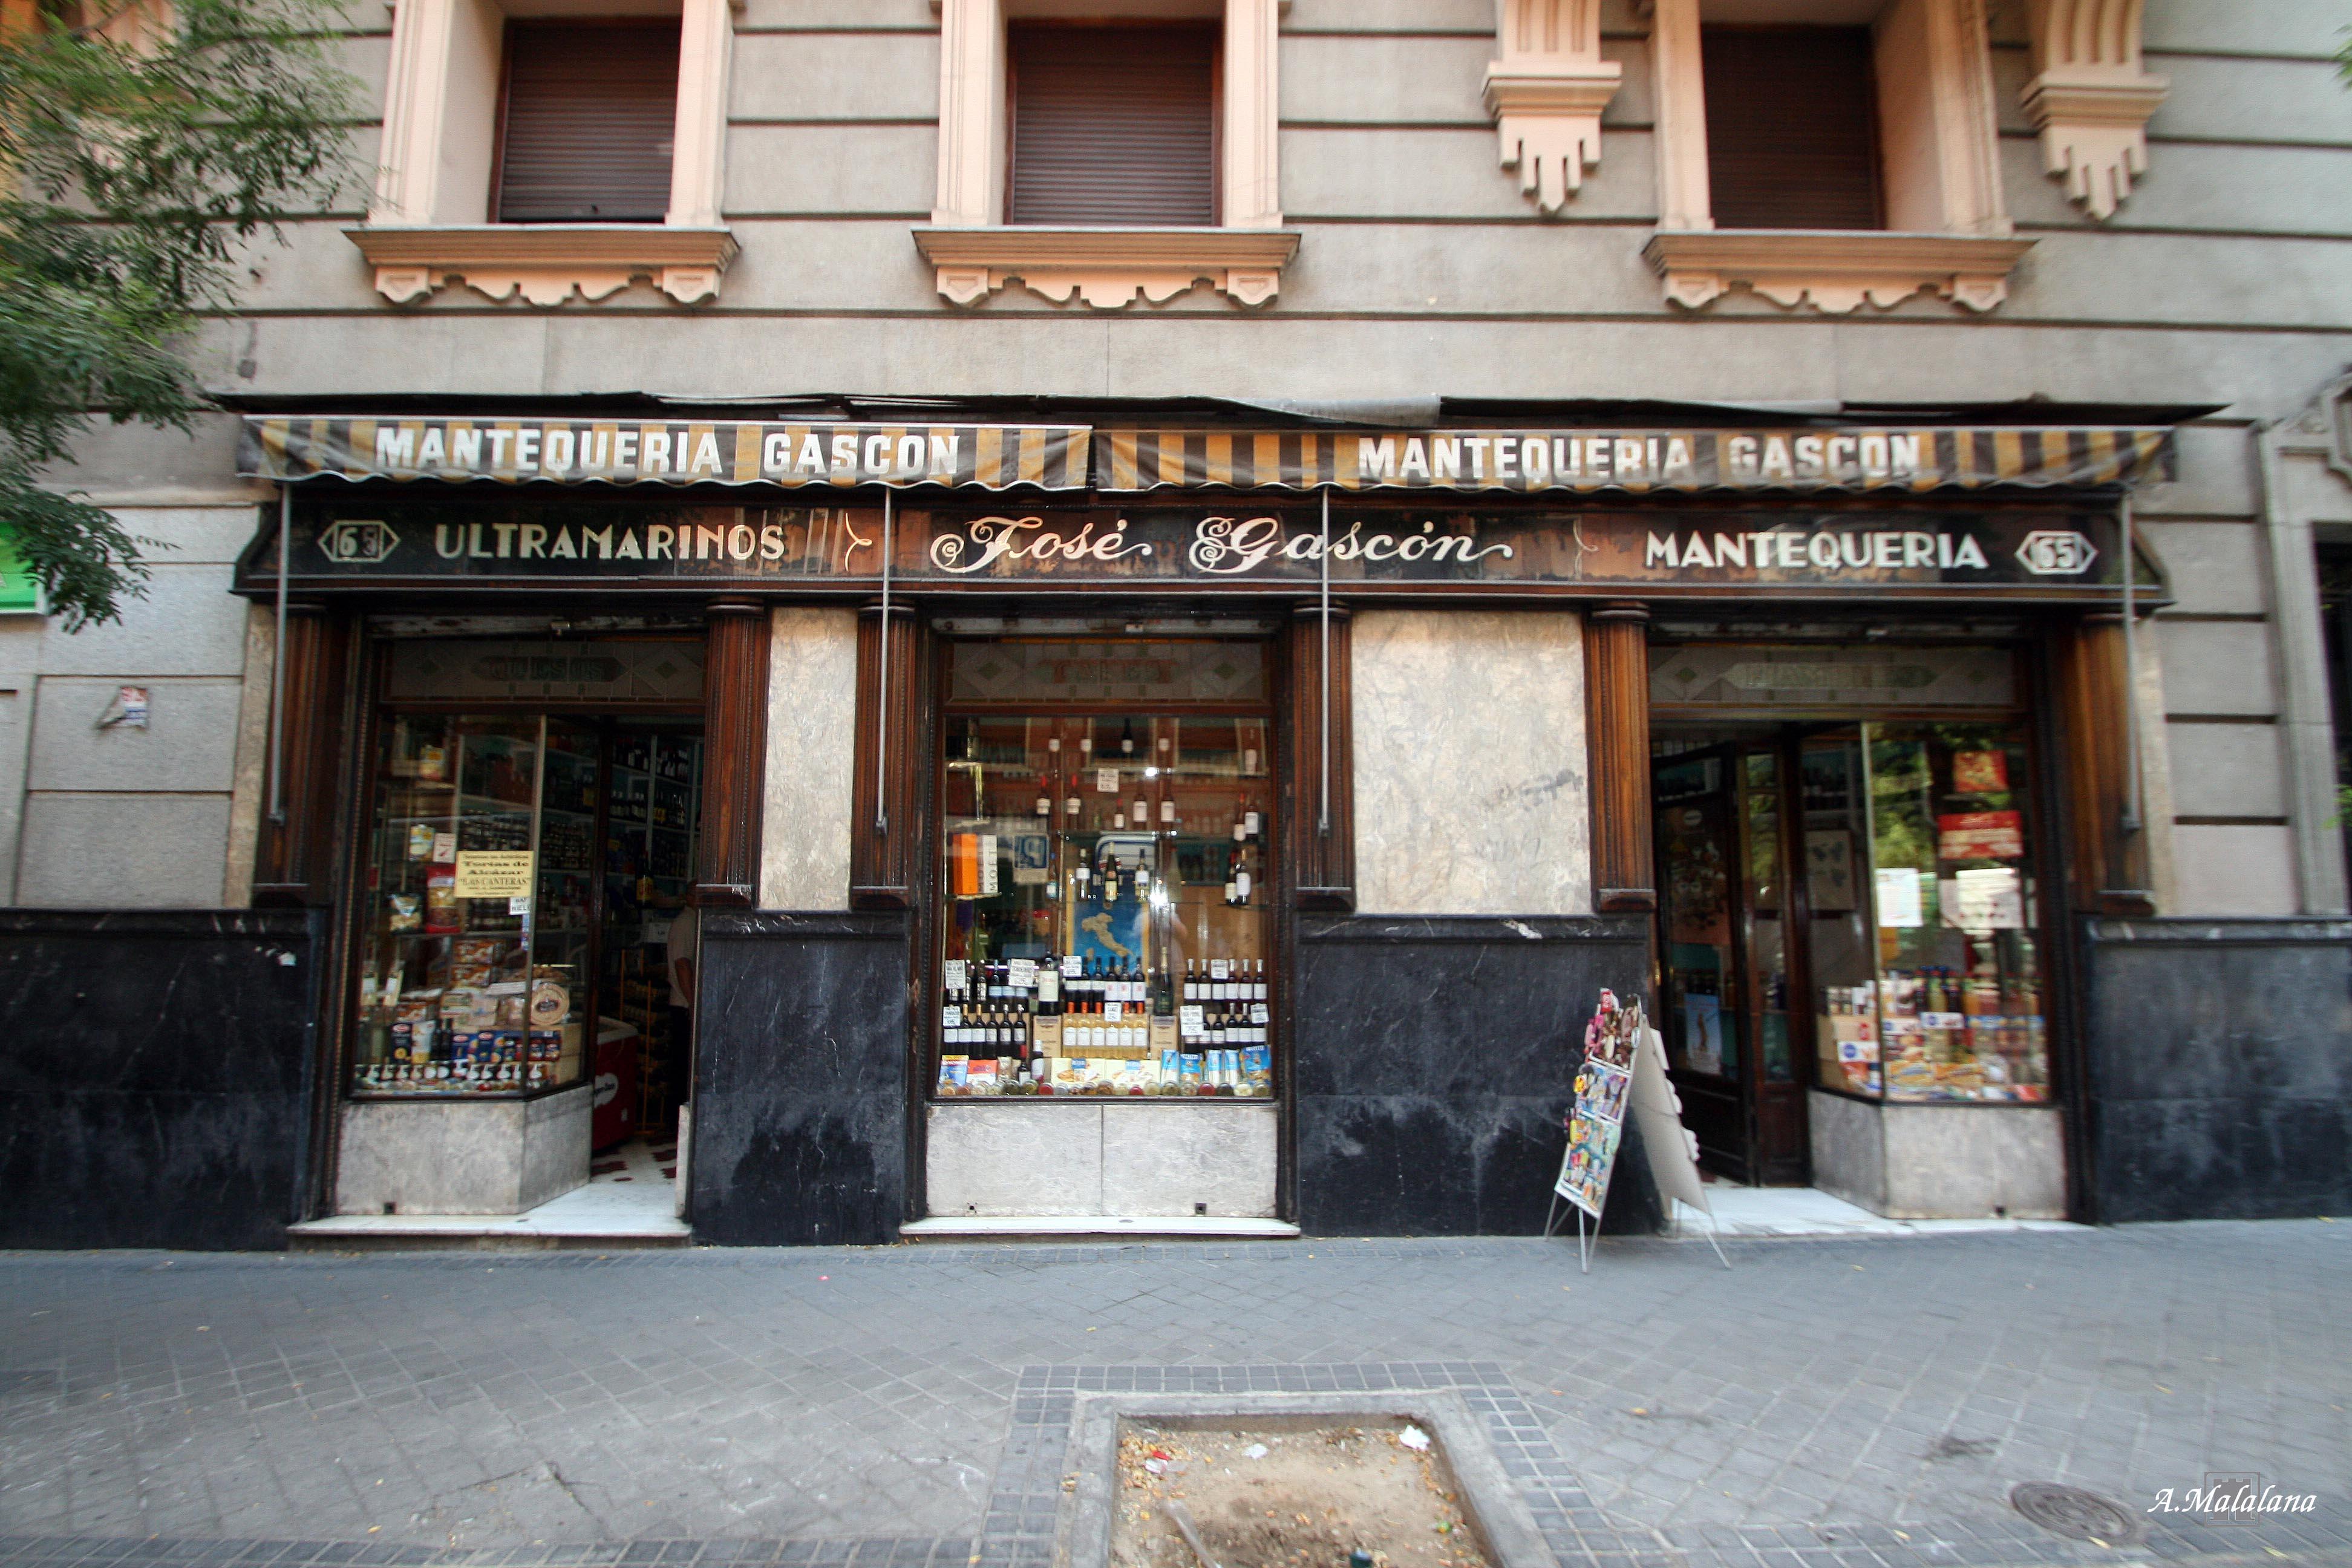 Mantequeria Jose Gascon Calle Zurbano 65 Calle De Almagro El